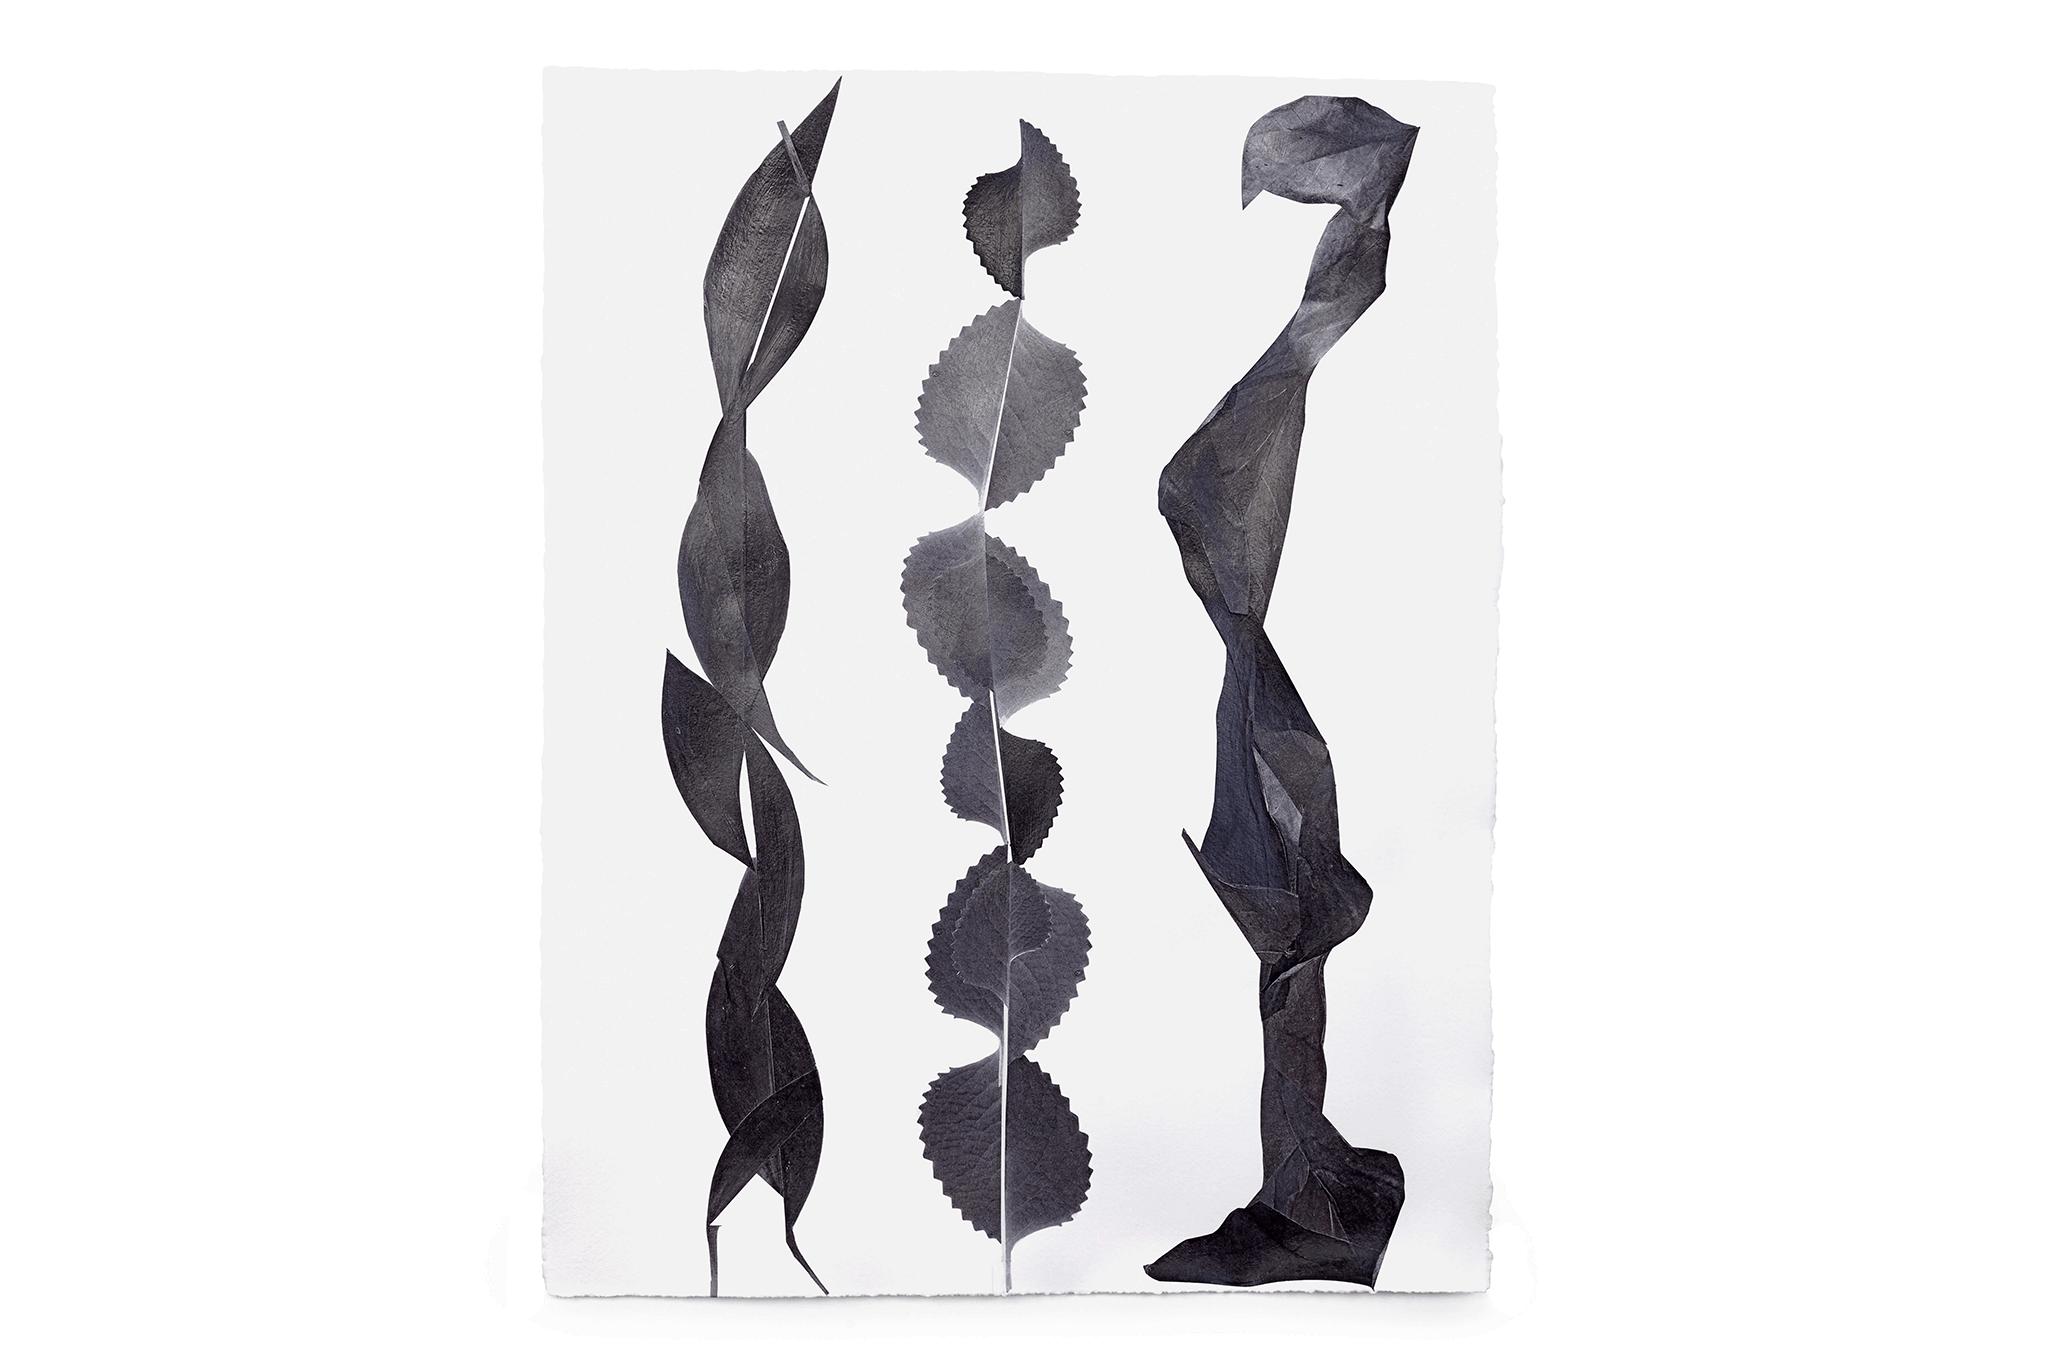 01_Frauke-Dannert_Collage_Ausstellung_Folie_Galerie-Lisa-Kandlhofer_Botanicals11